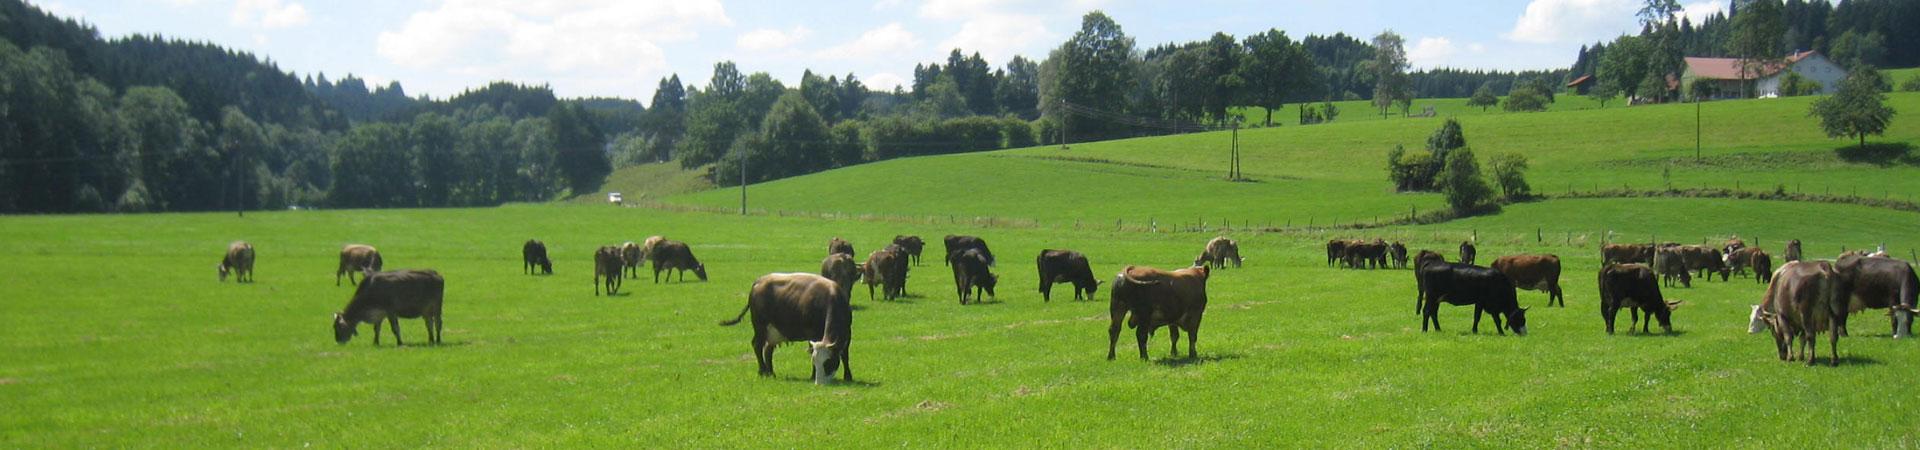 agroecology herd